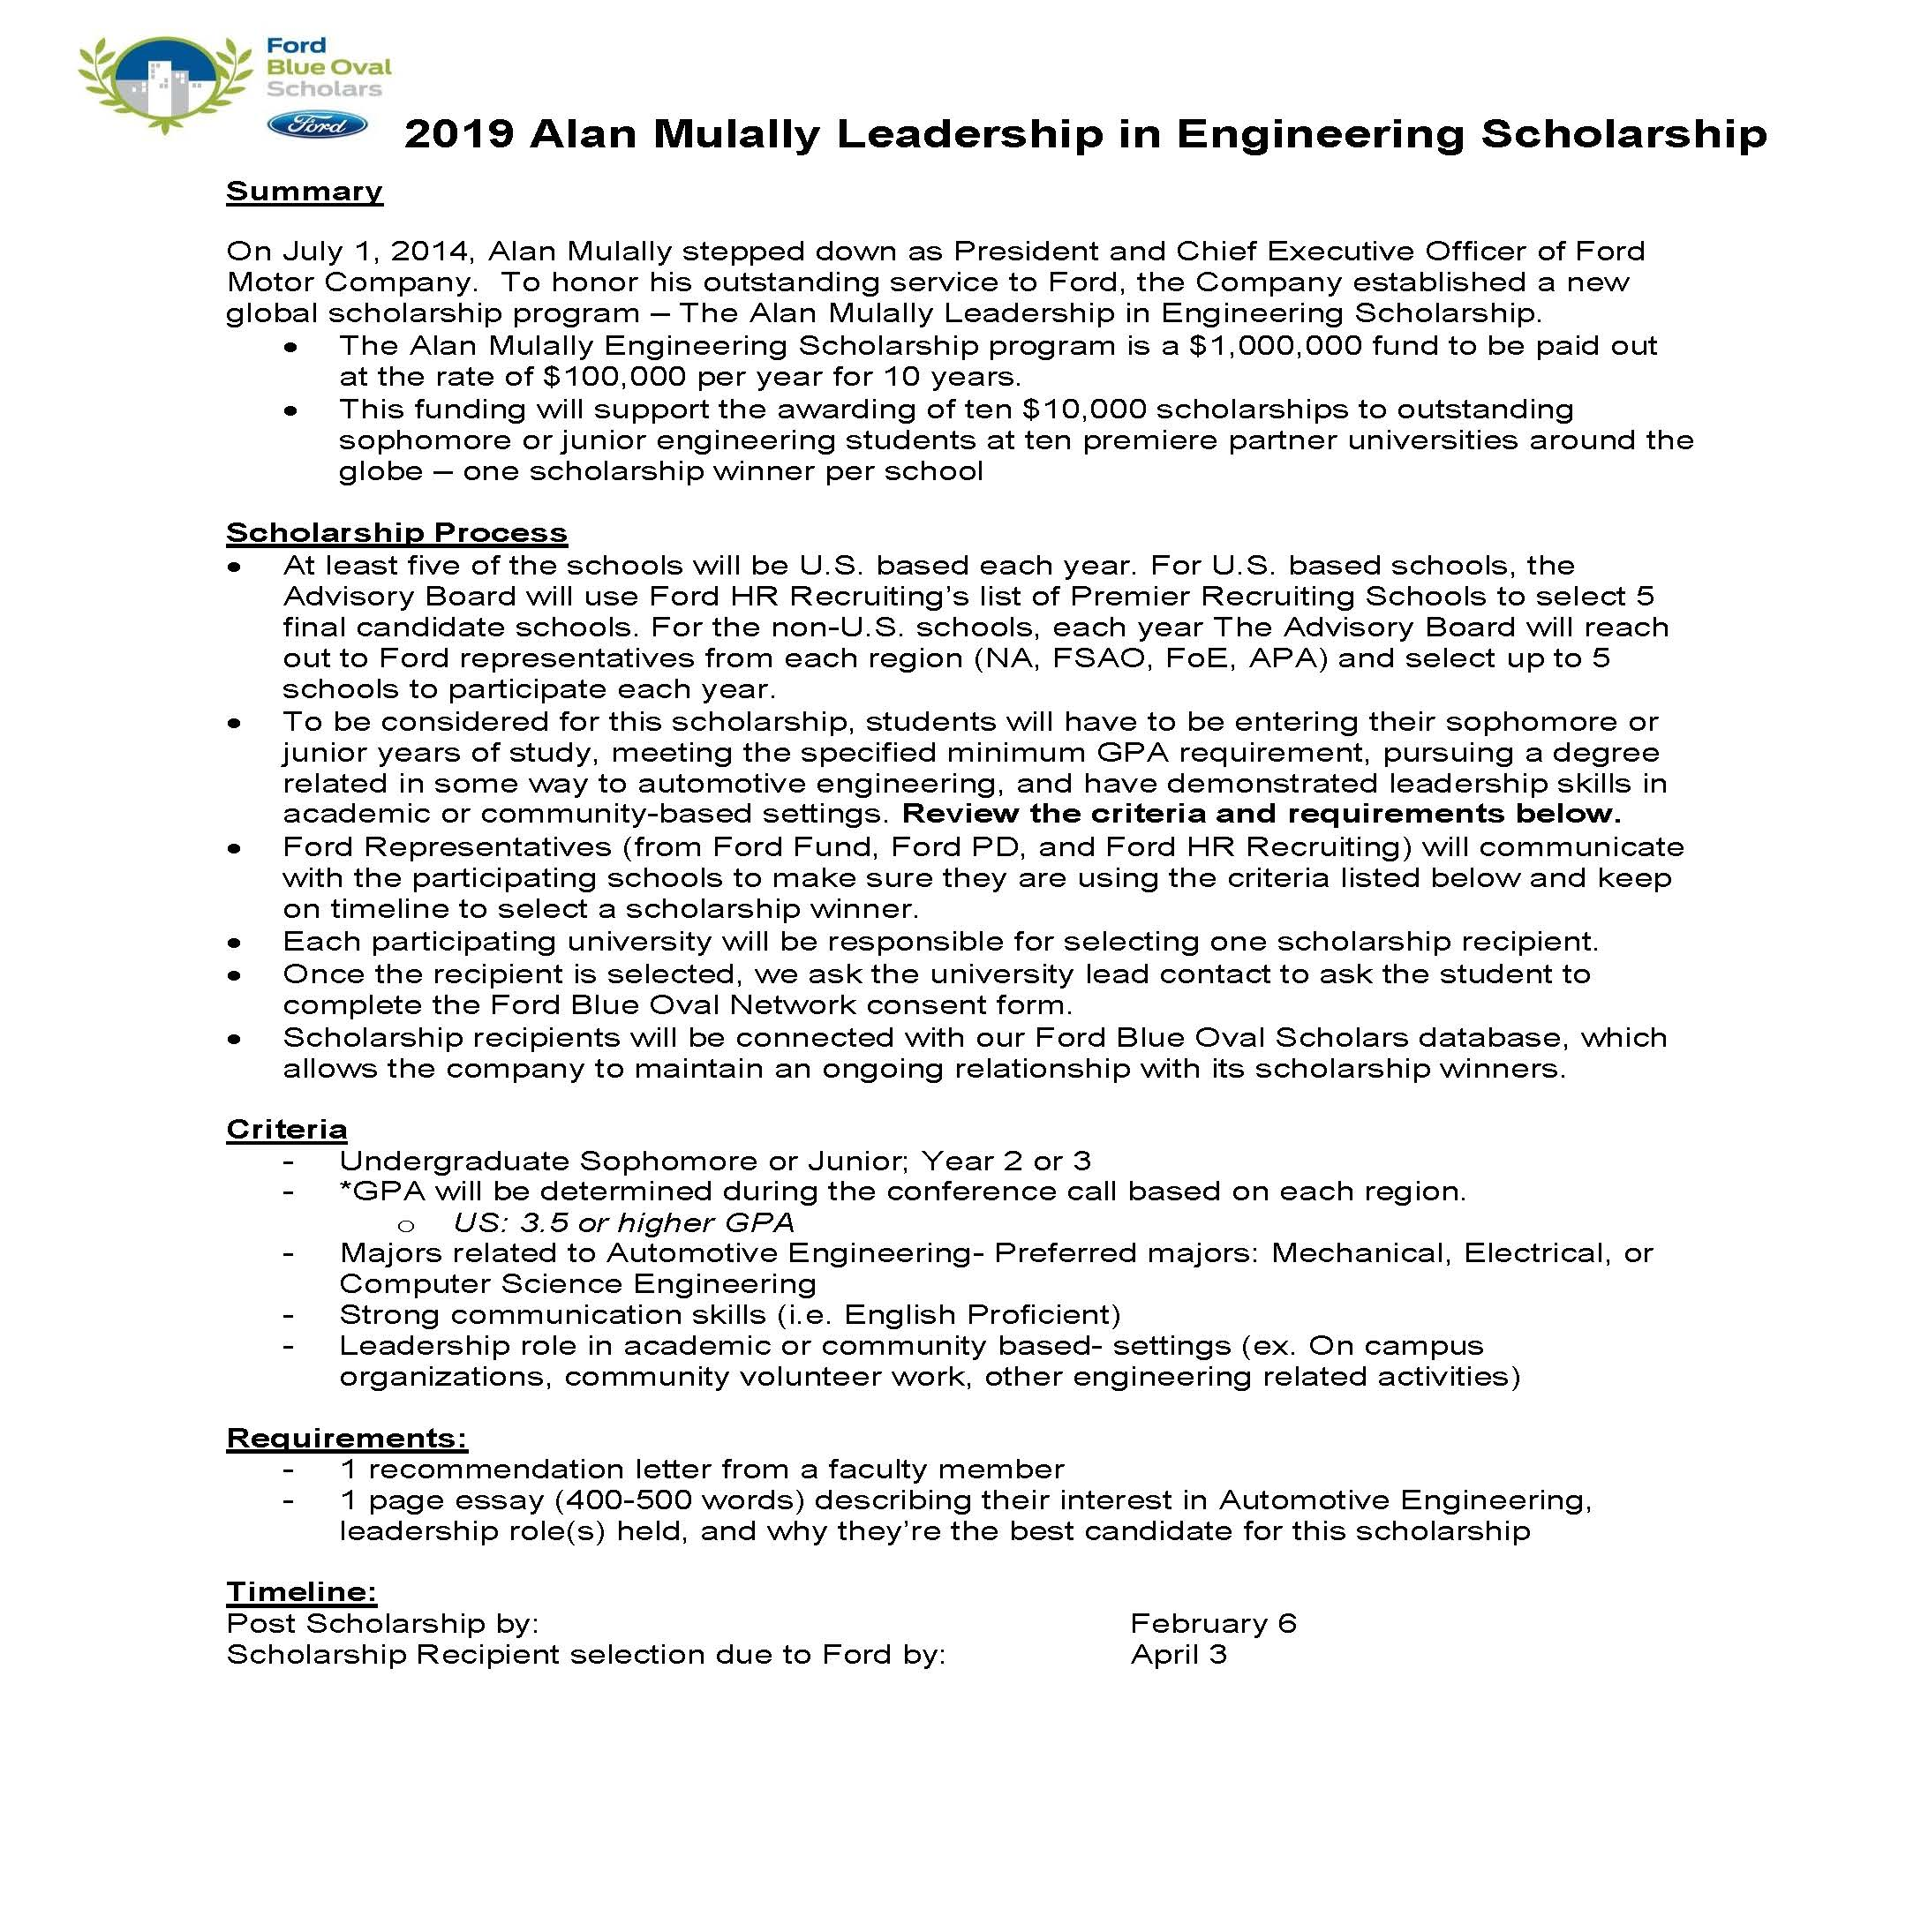 2019 Alan Mulally Leadership in Engineering Scholarship